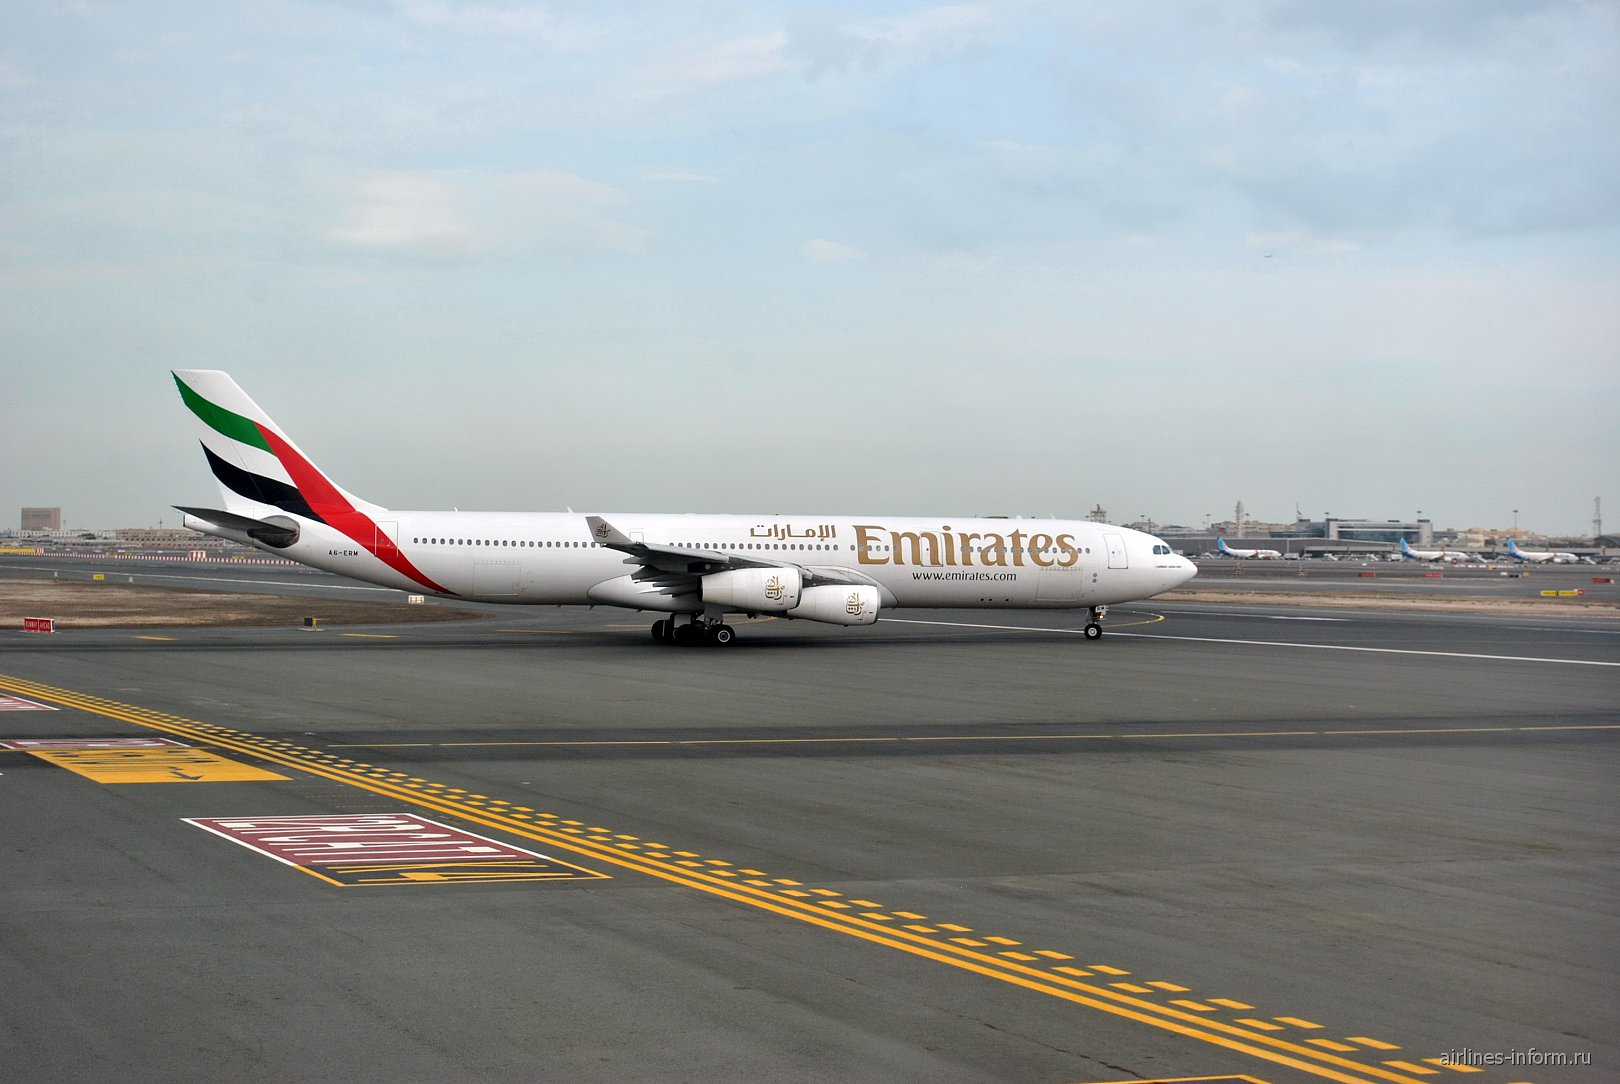 Airbus A340-300 авиакомпании Emirates в аэропорту Дубай